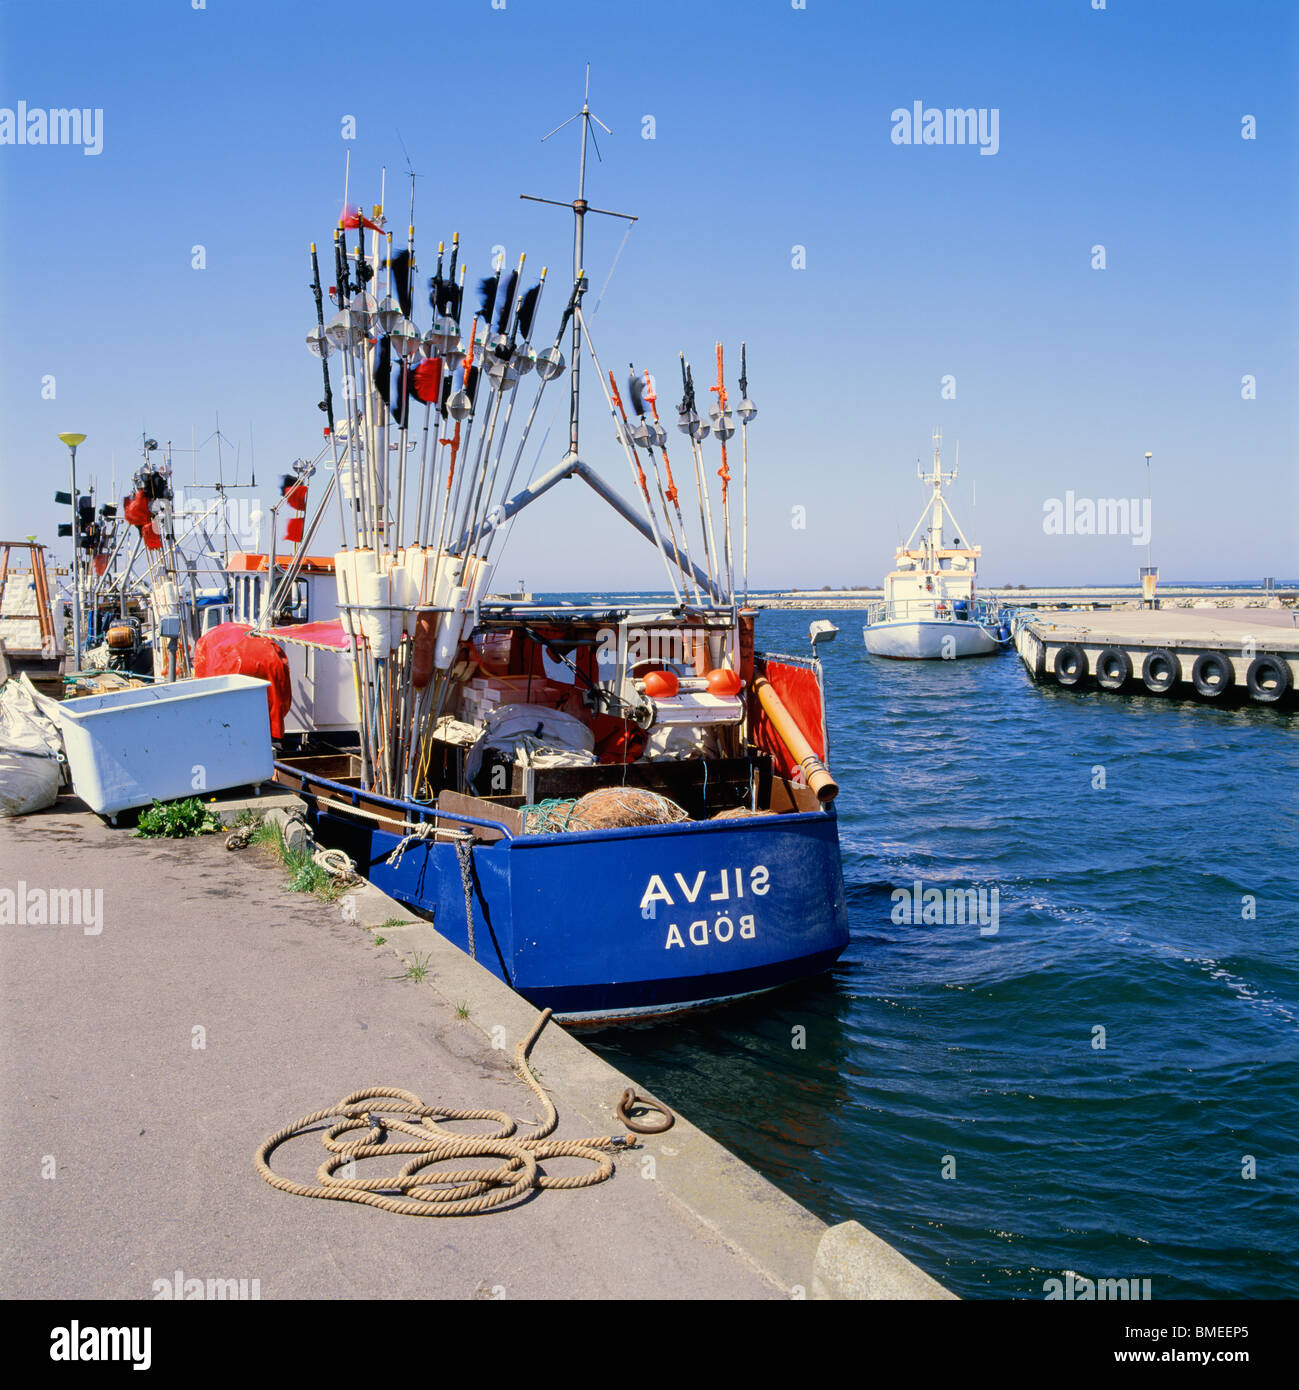 View of fishing trawler - Stock Image